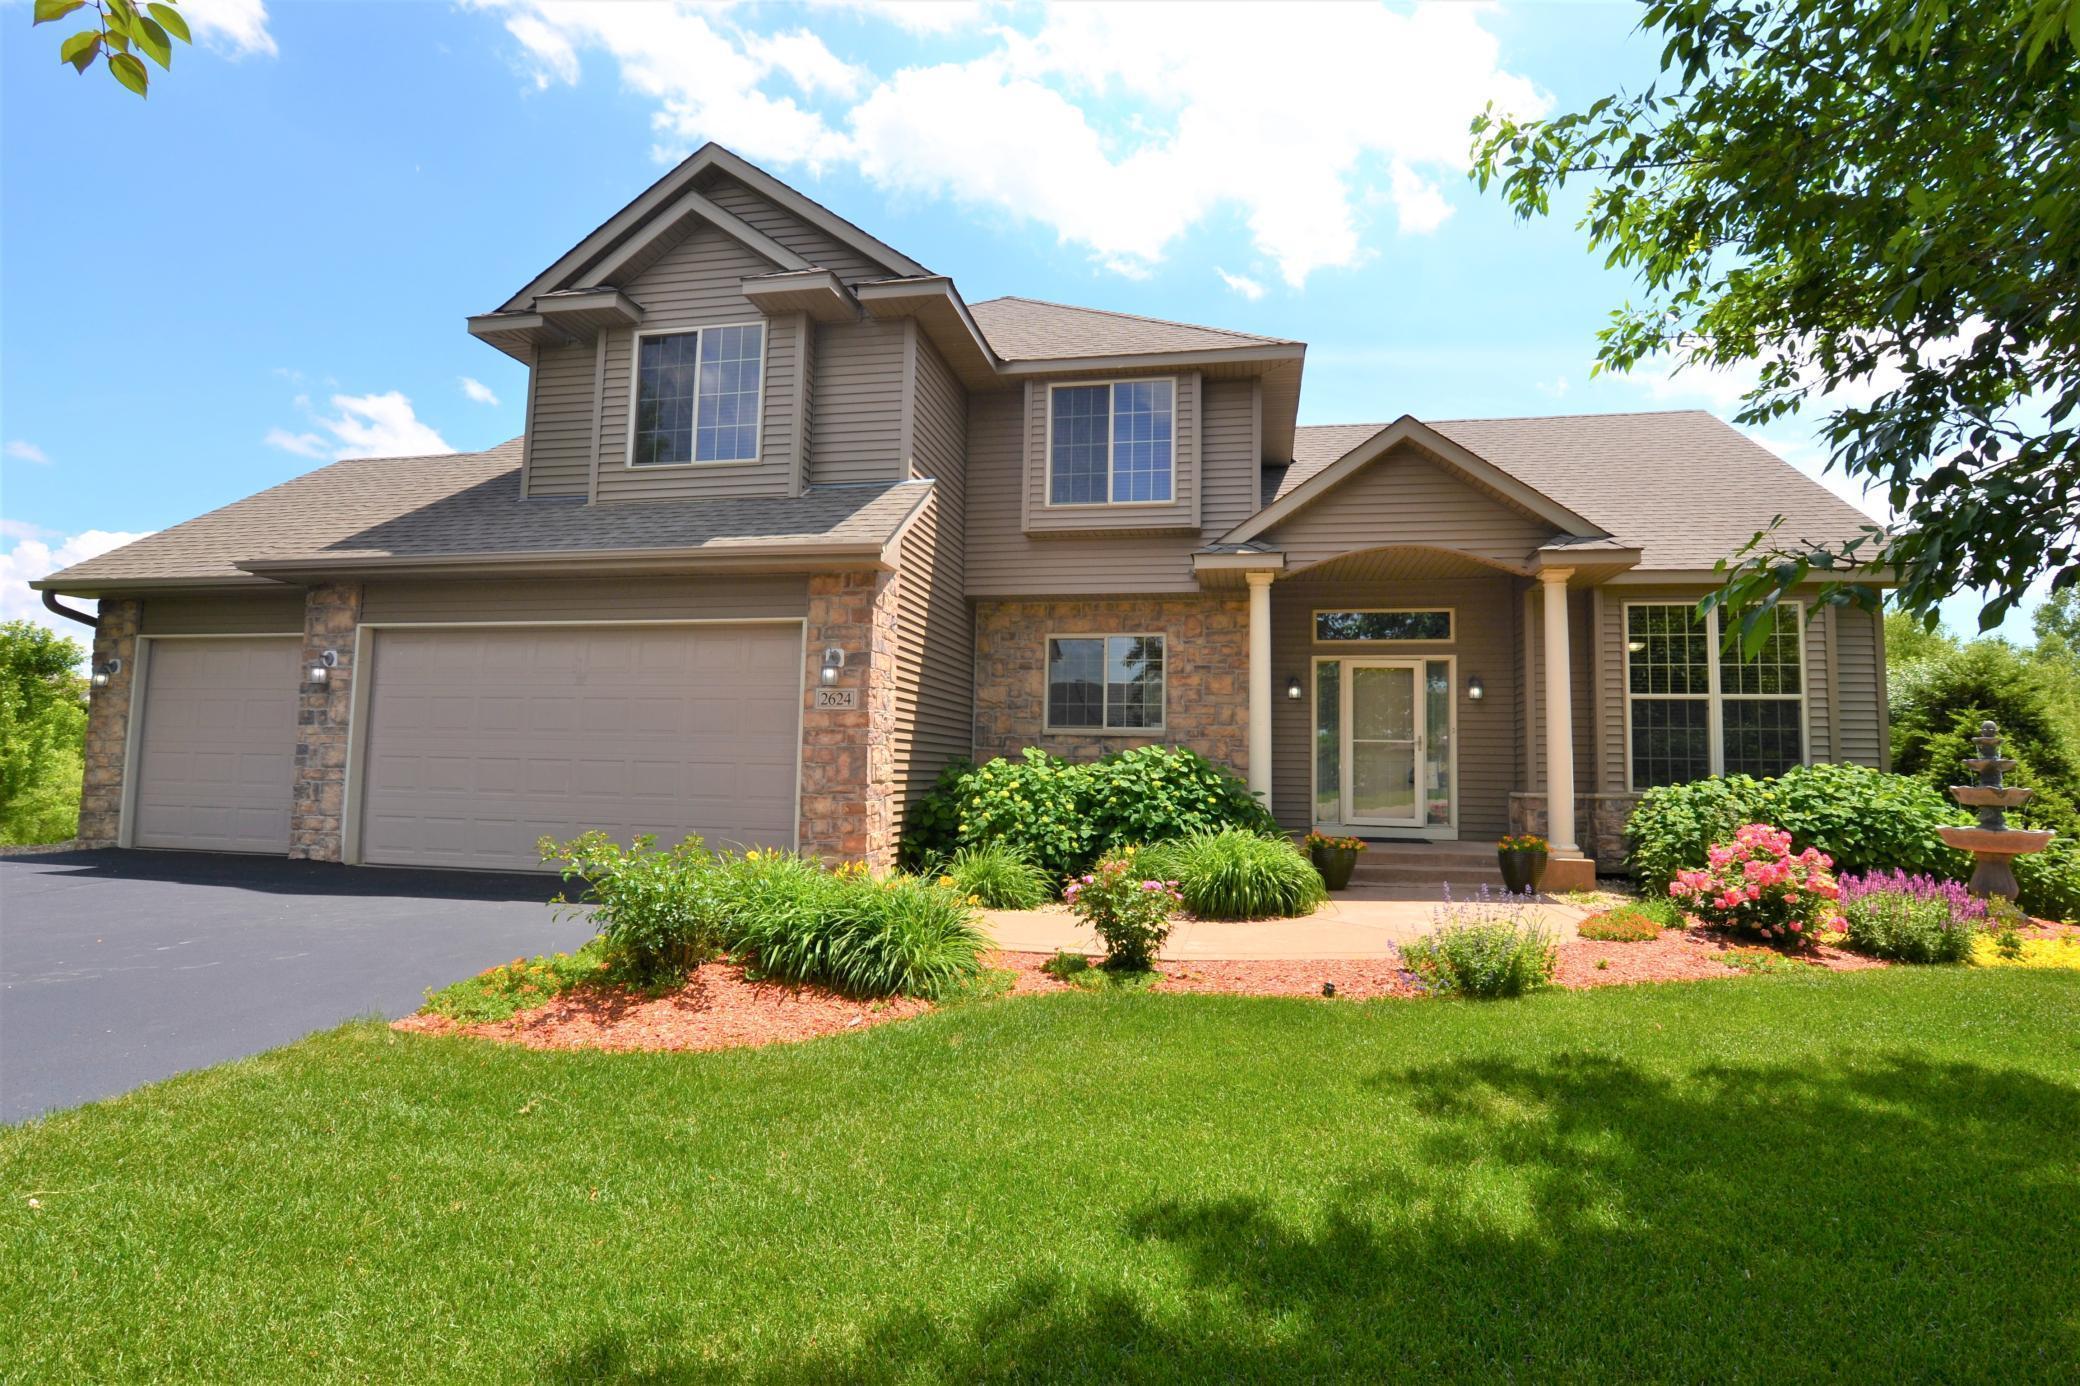 2624 Anna Property Photo - Elko New Market, MN real estate listing